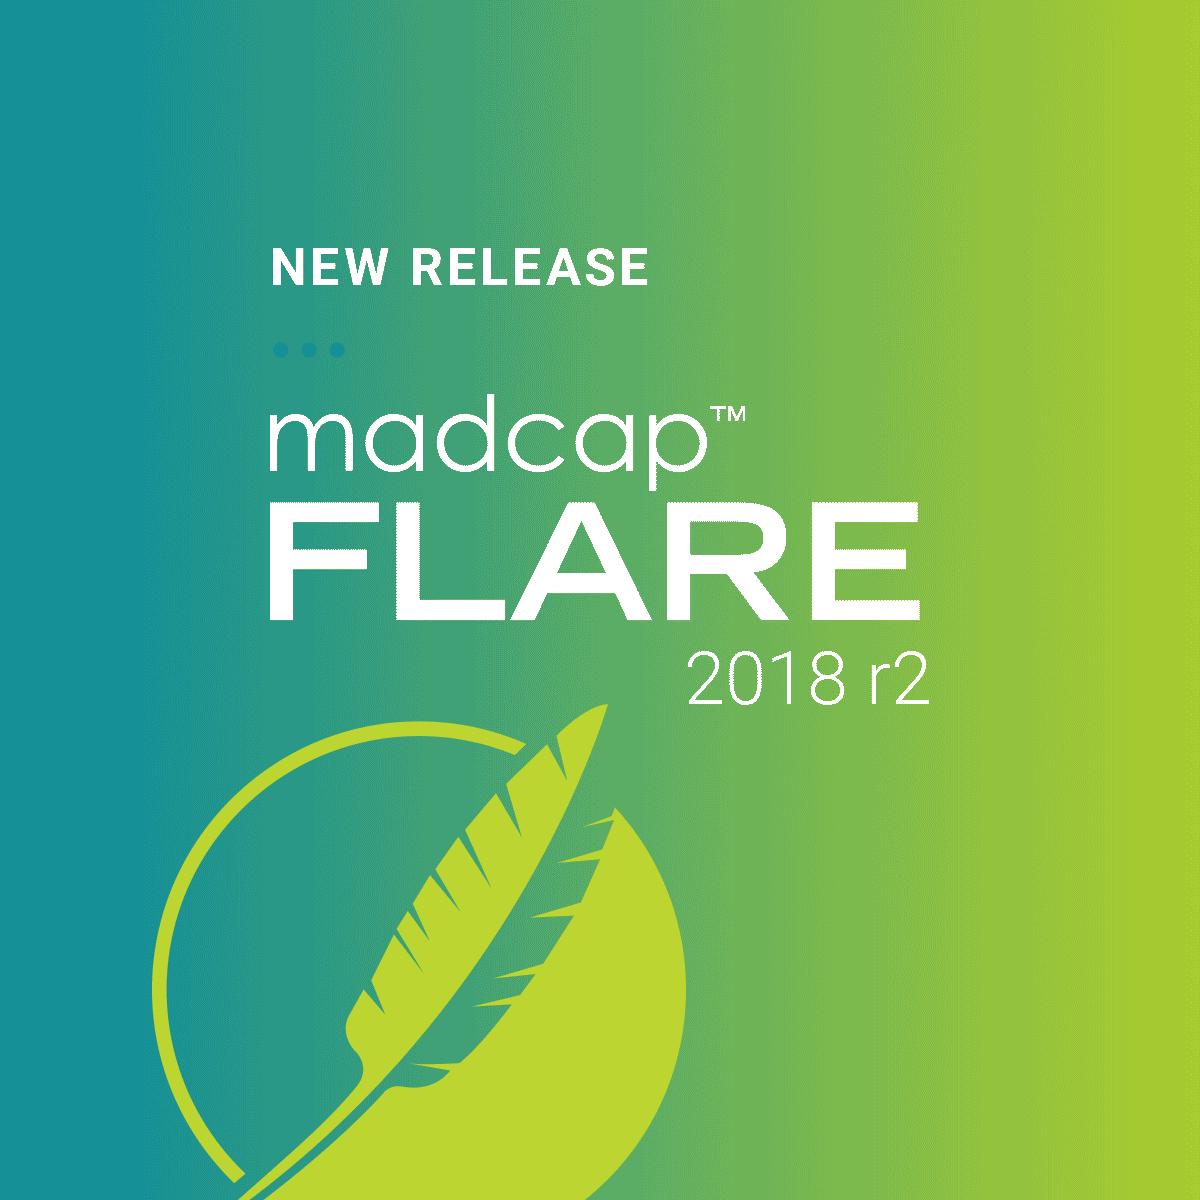 New Release - MadCap Flare 2018 r2